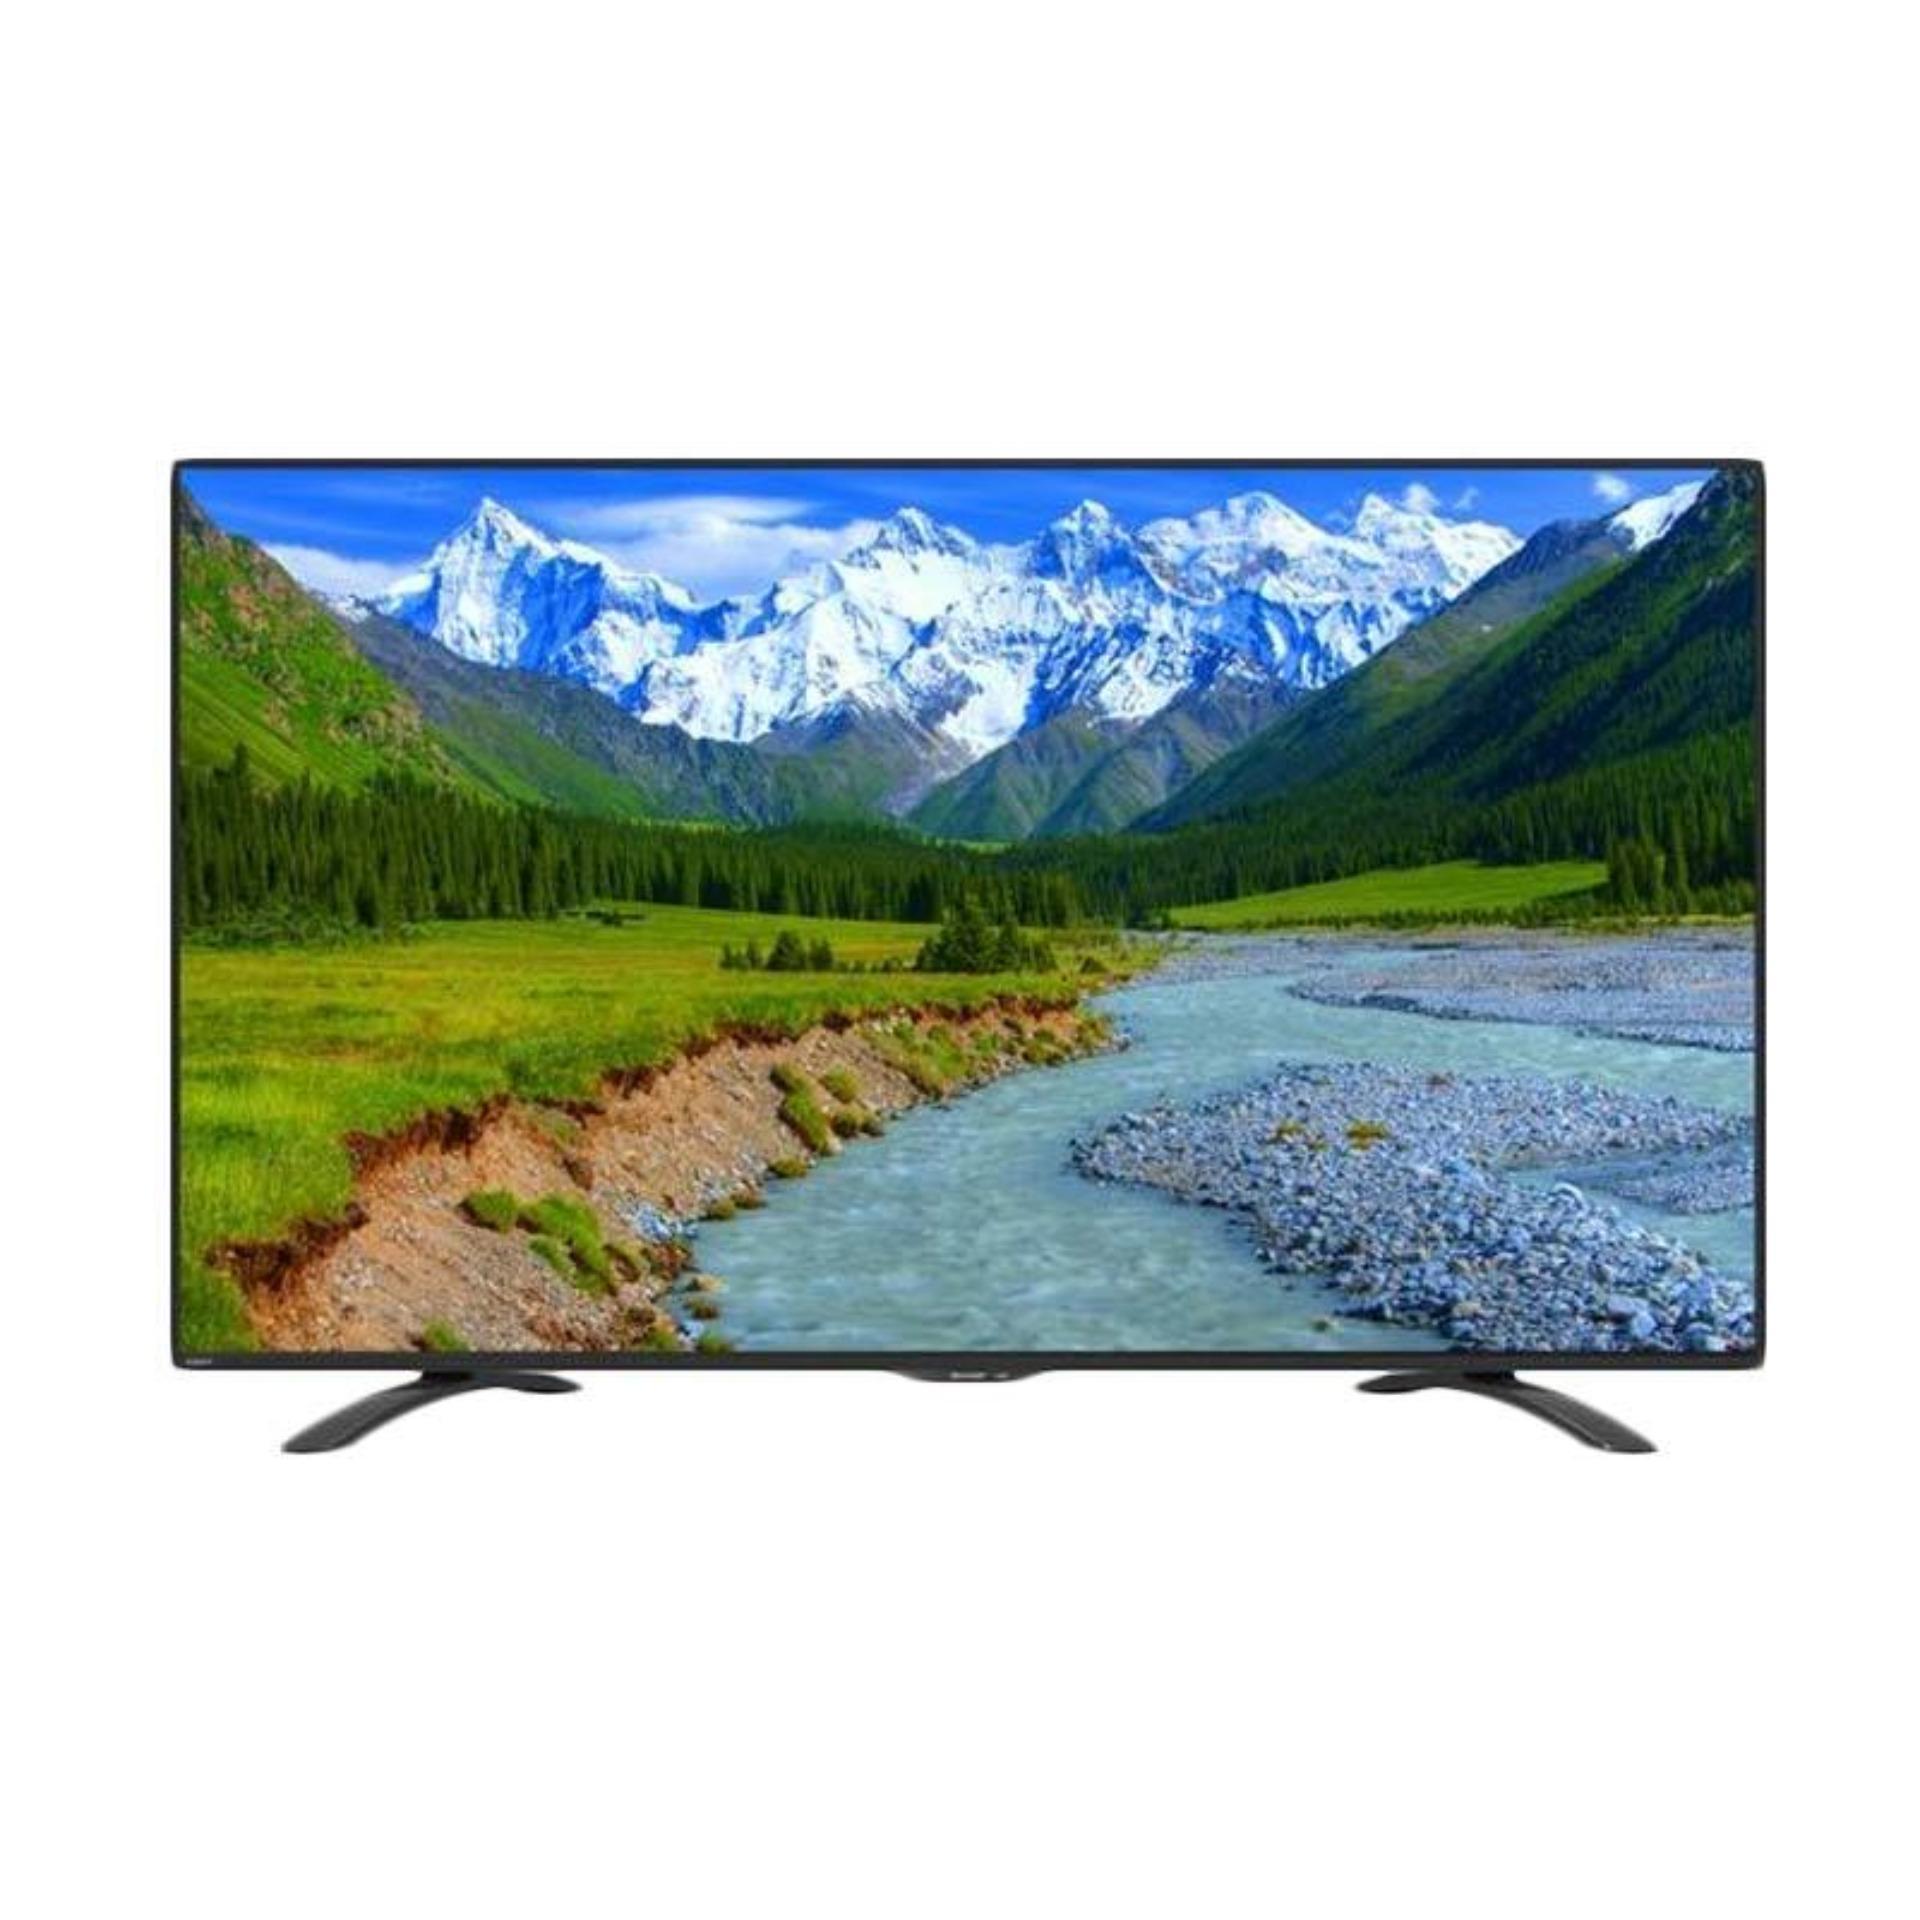 Panasonic Led Tv 49 Inchi Th 49d410 Daftar Harga Terupdate Indonesia Ikedo 32 Inch M1a Dolby Surround Sytema Hitam Gratis Powerstrip Huntkey Sga301 Sharp 60 Lc 60le275x Black